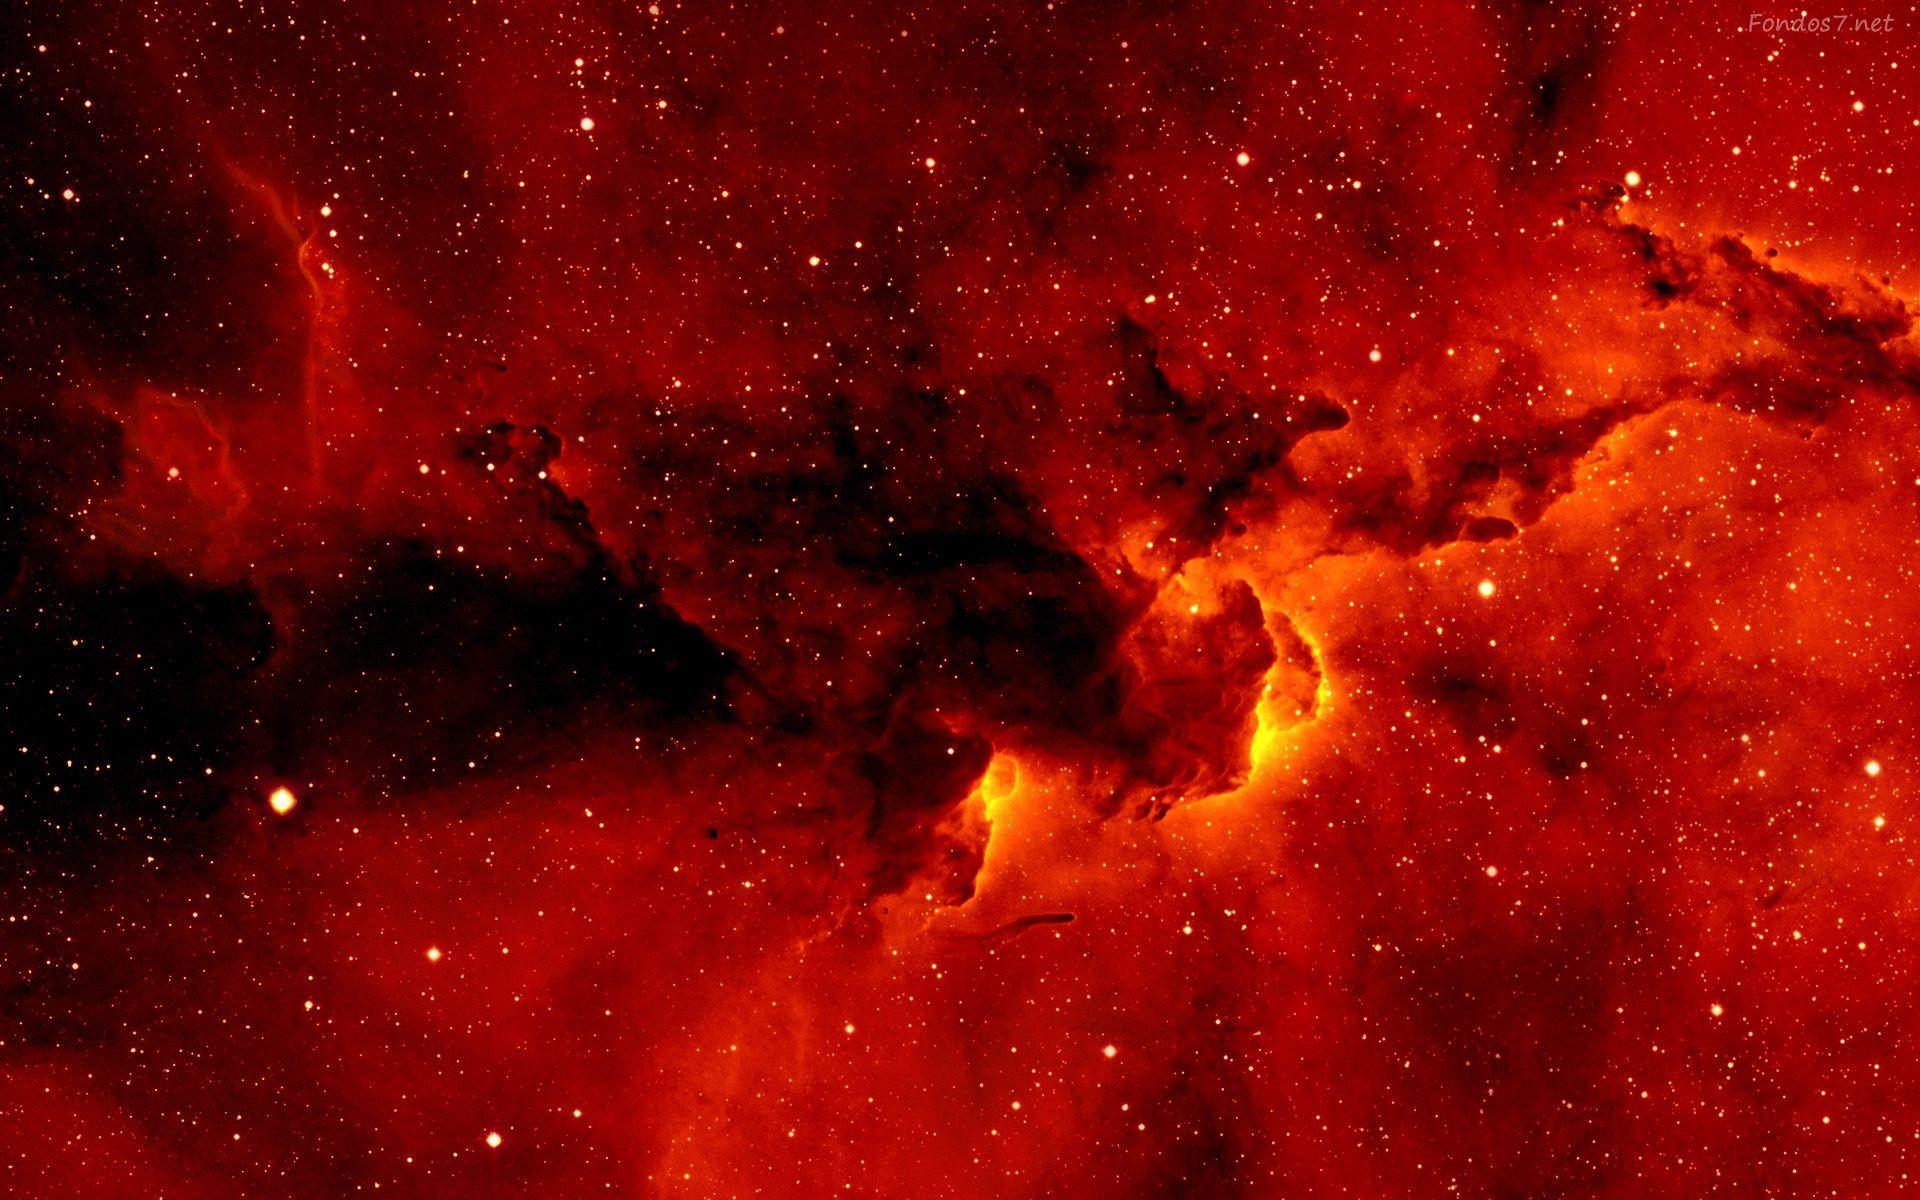 6b95157ed galaxia-roja-4227.jpg (1920×1200) | Galaxias | Pinterest